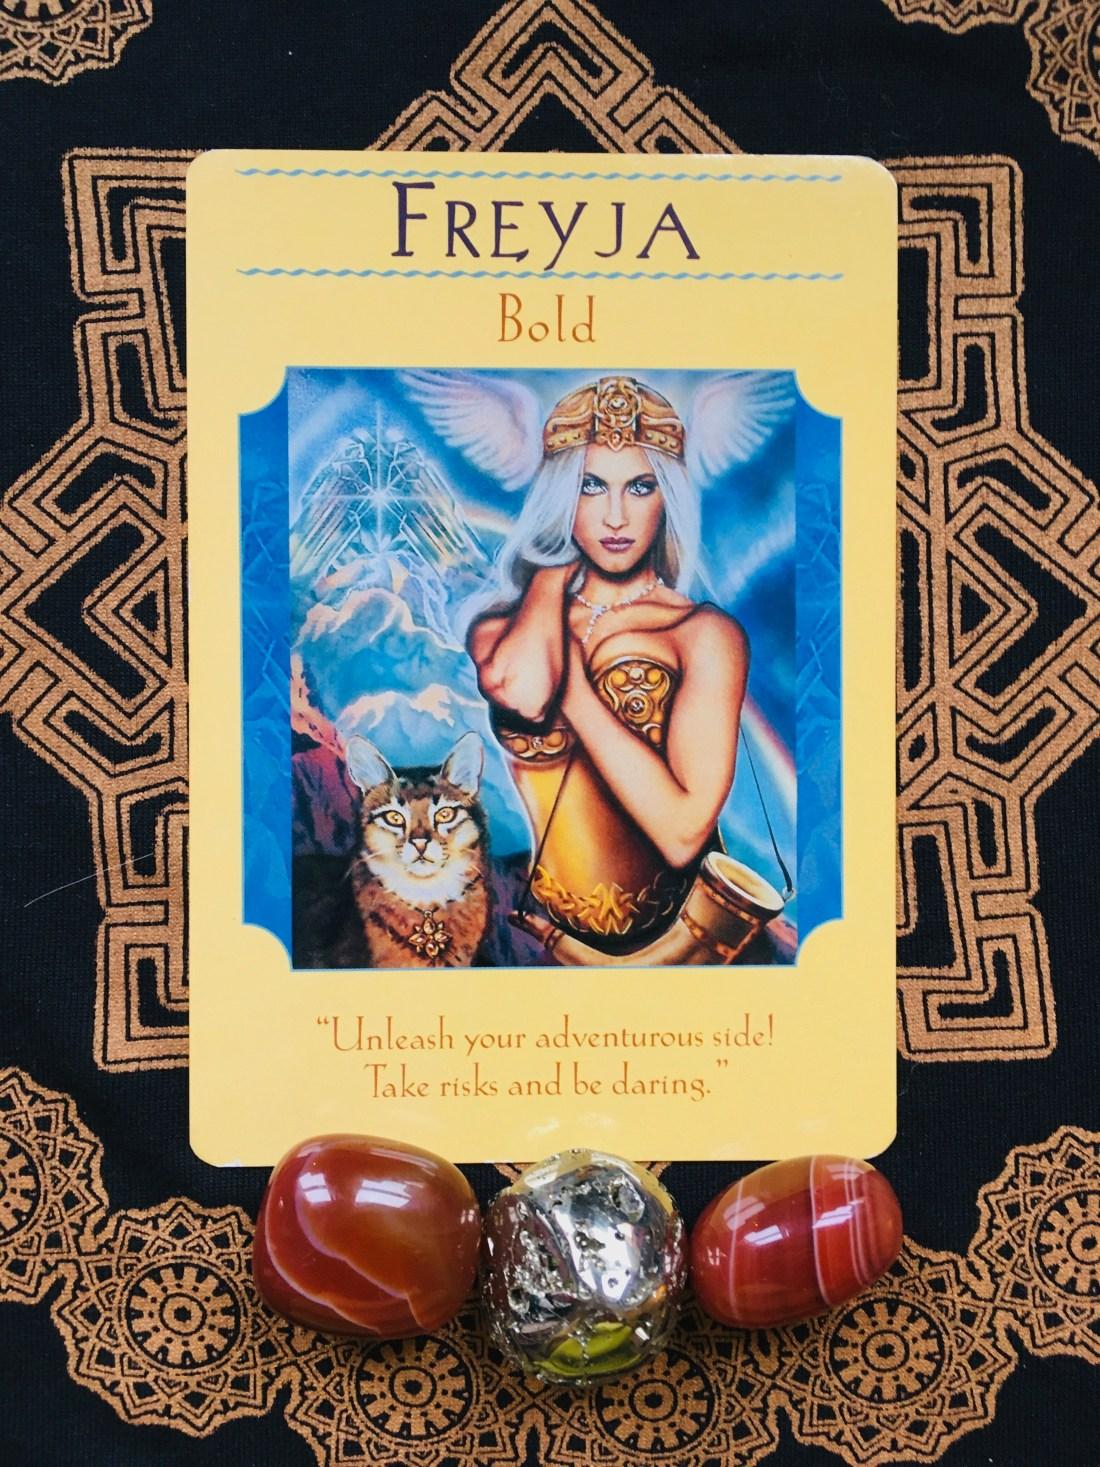 Freya Nordic Goddess means take a risk